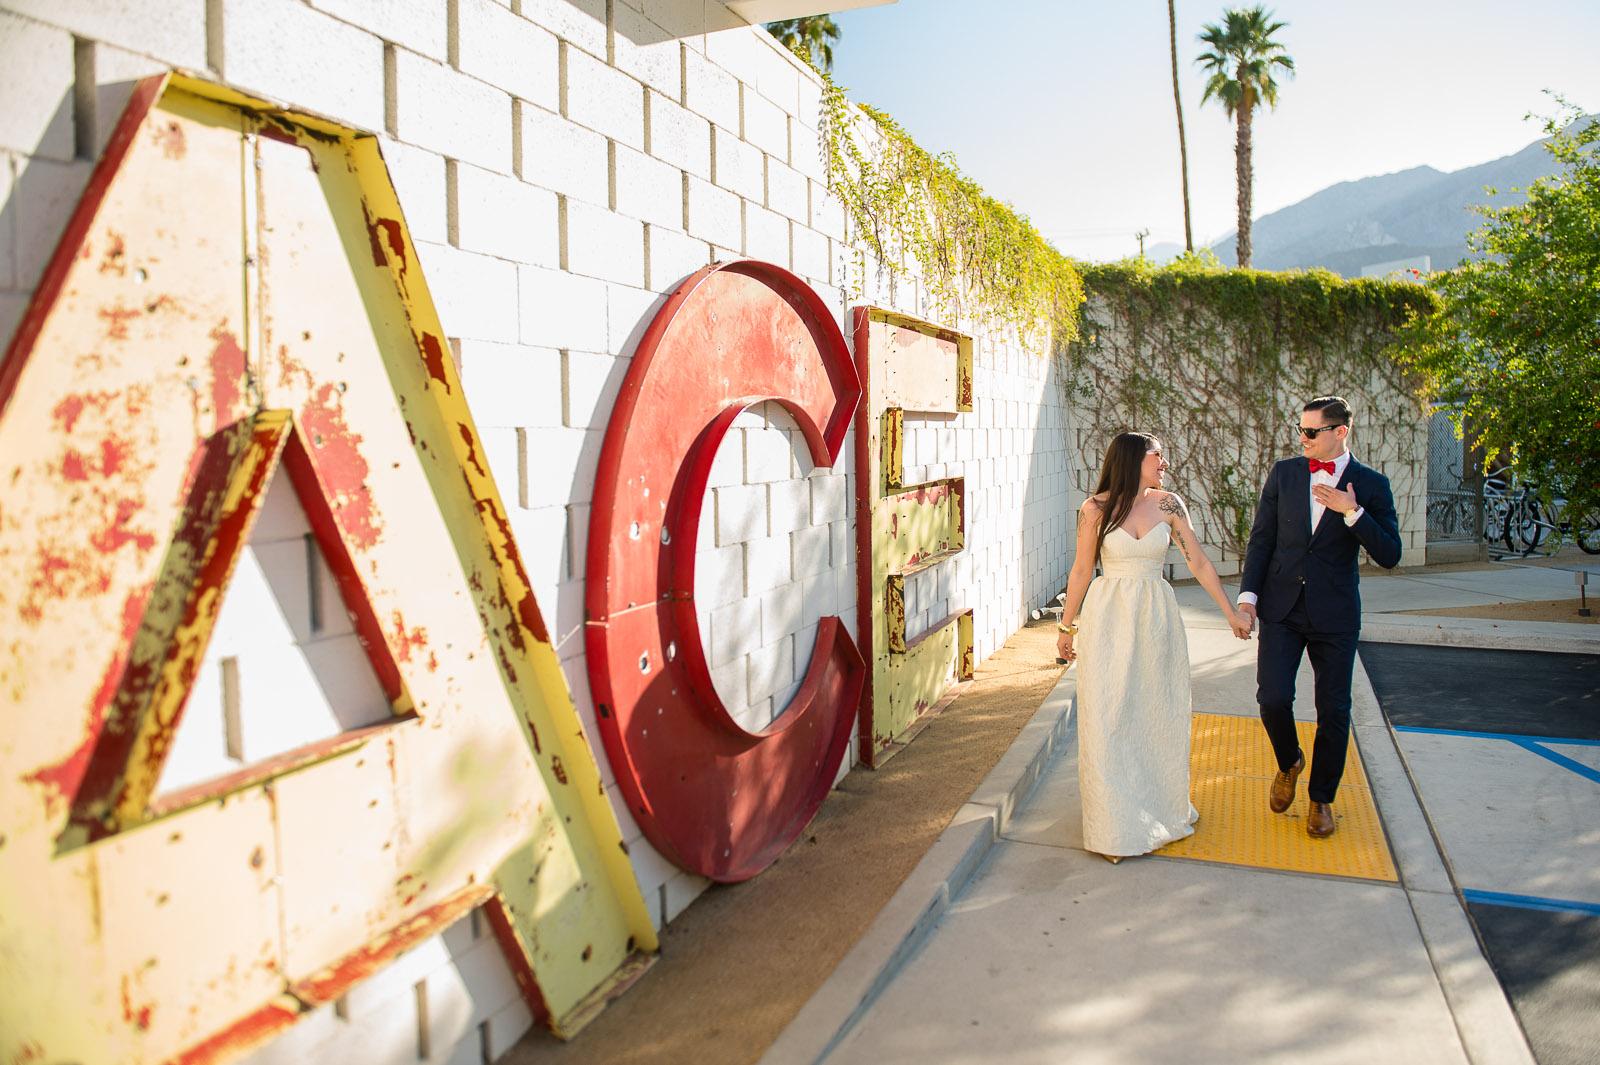 ace-hotel-palm-springs-wedding-29.jpg